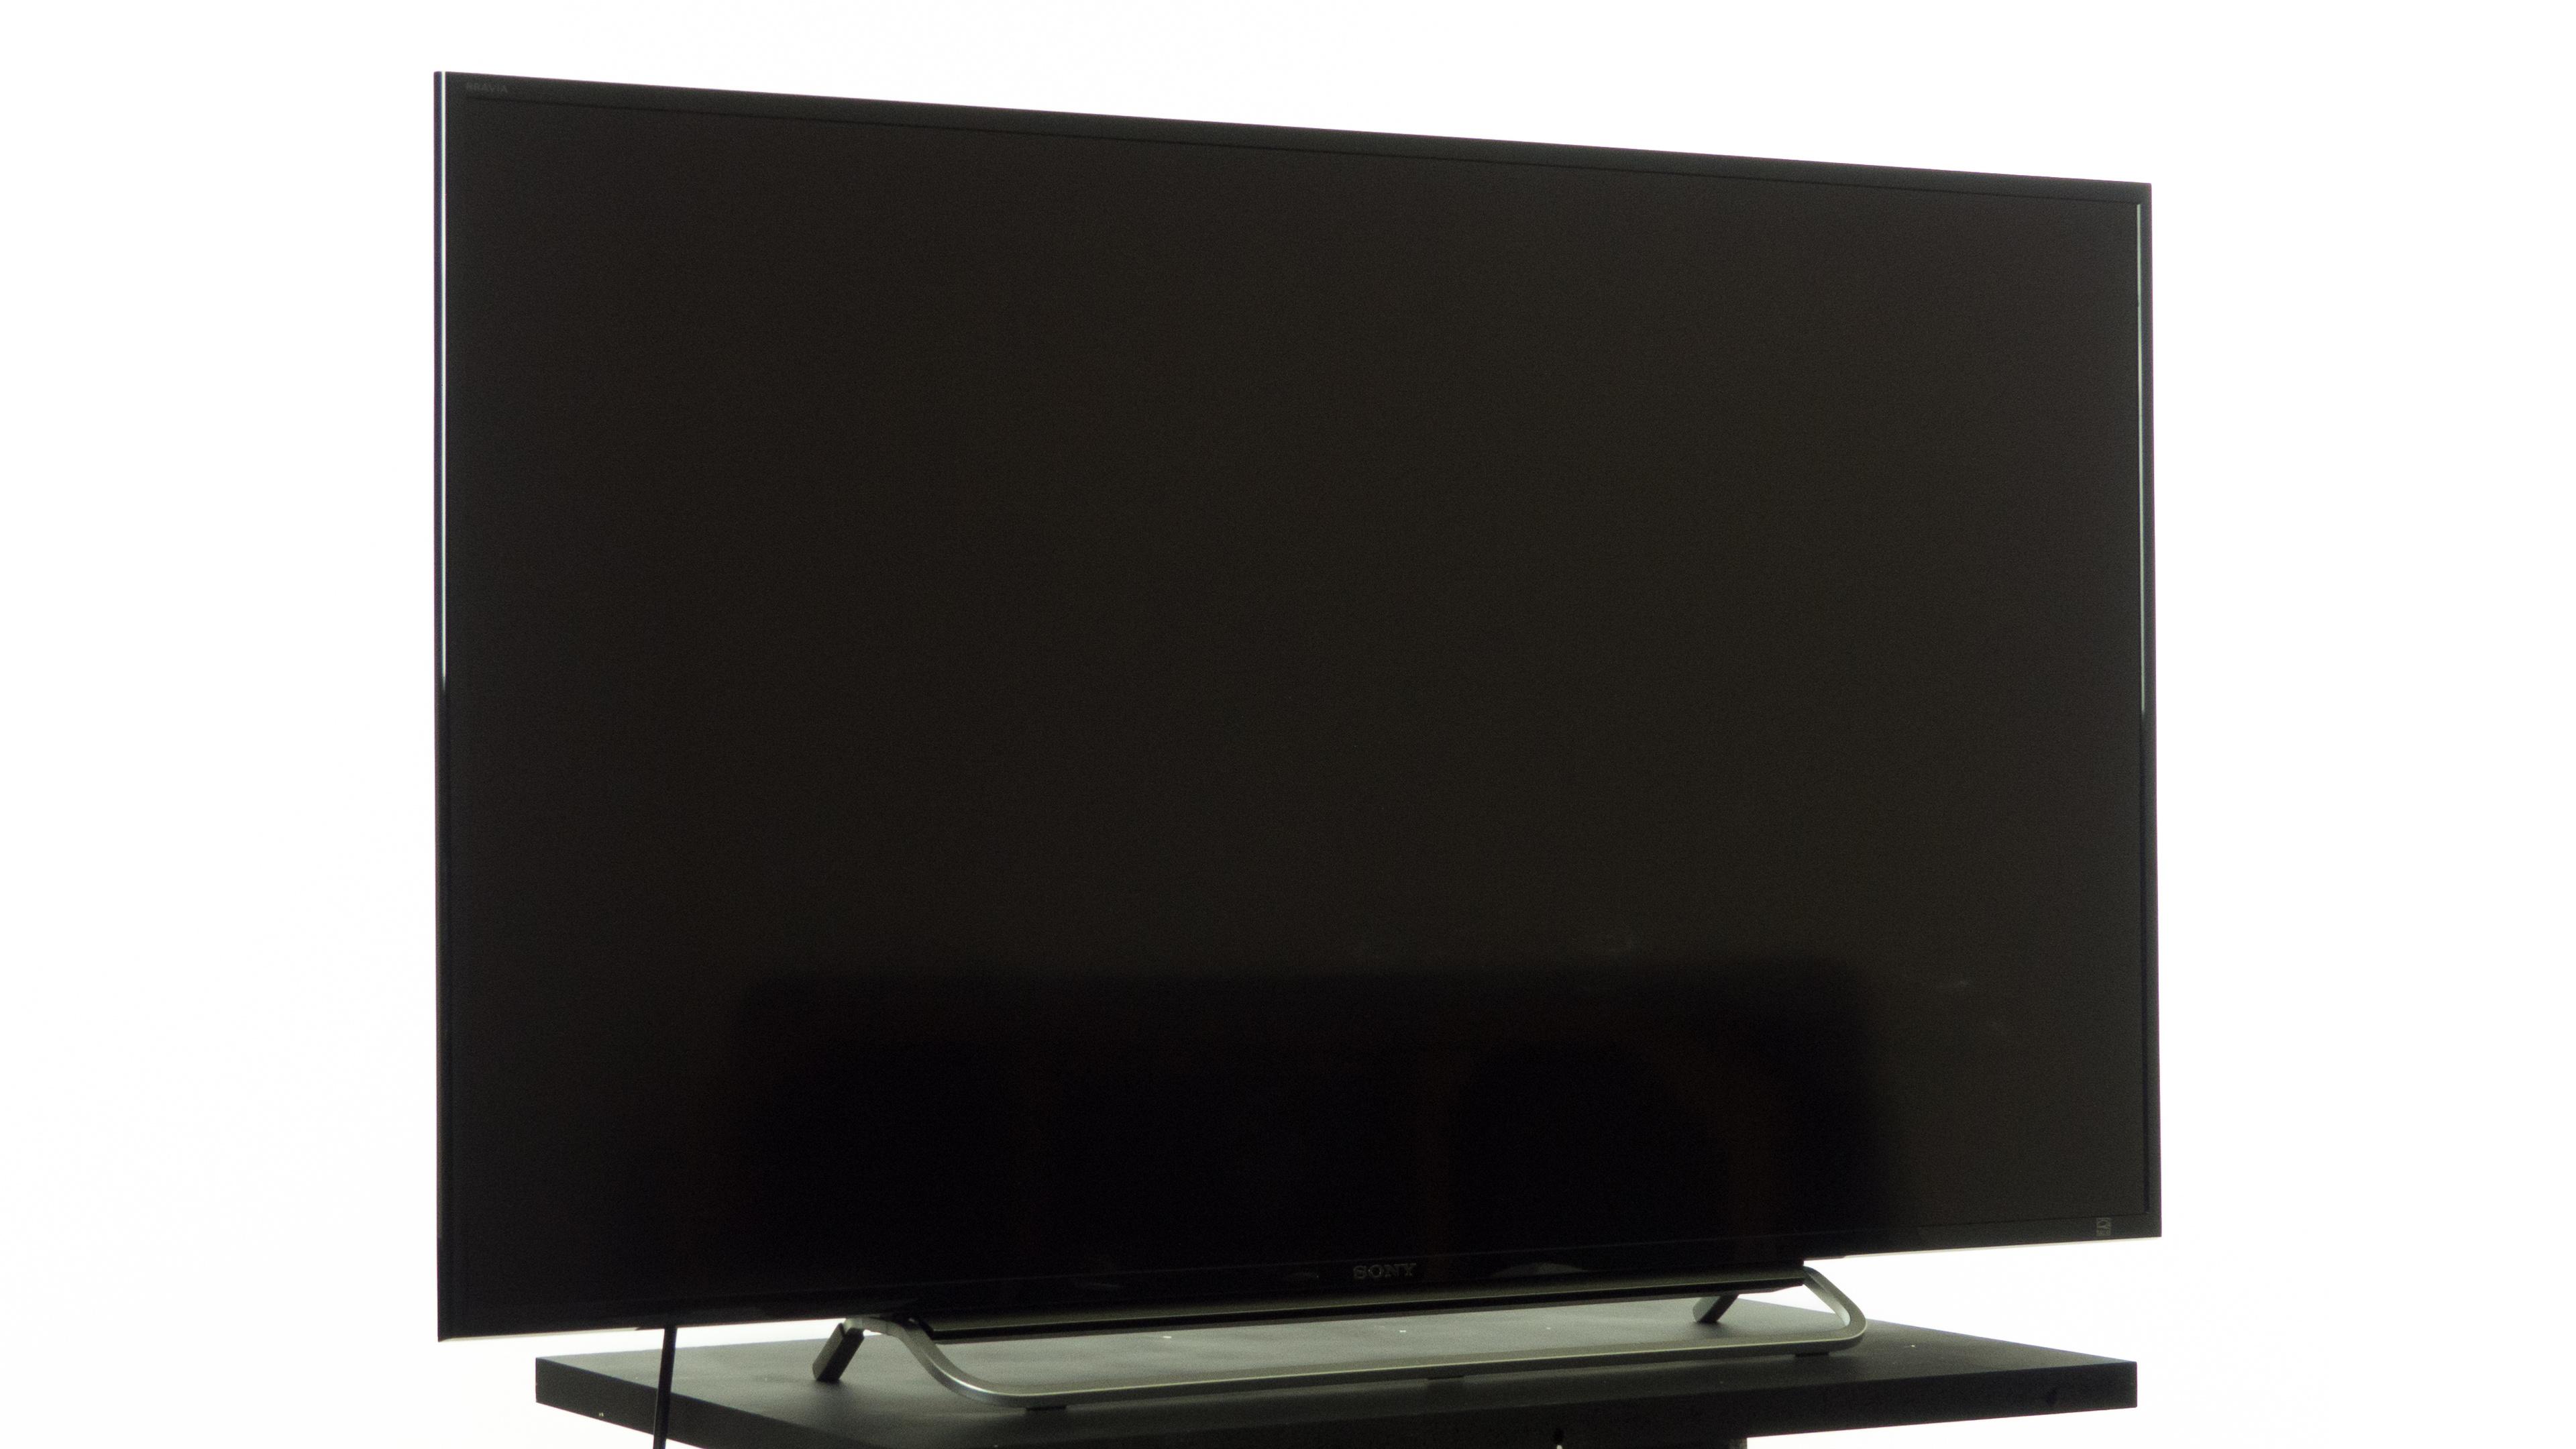 Sony W600B Review (KDL40W600B, KDL48W600B) - RTINGS com